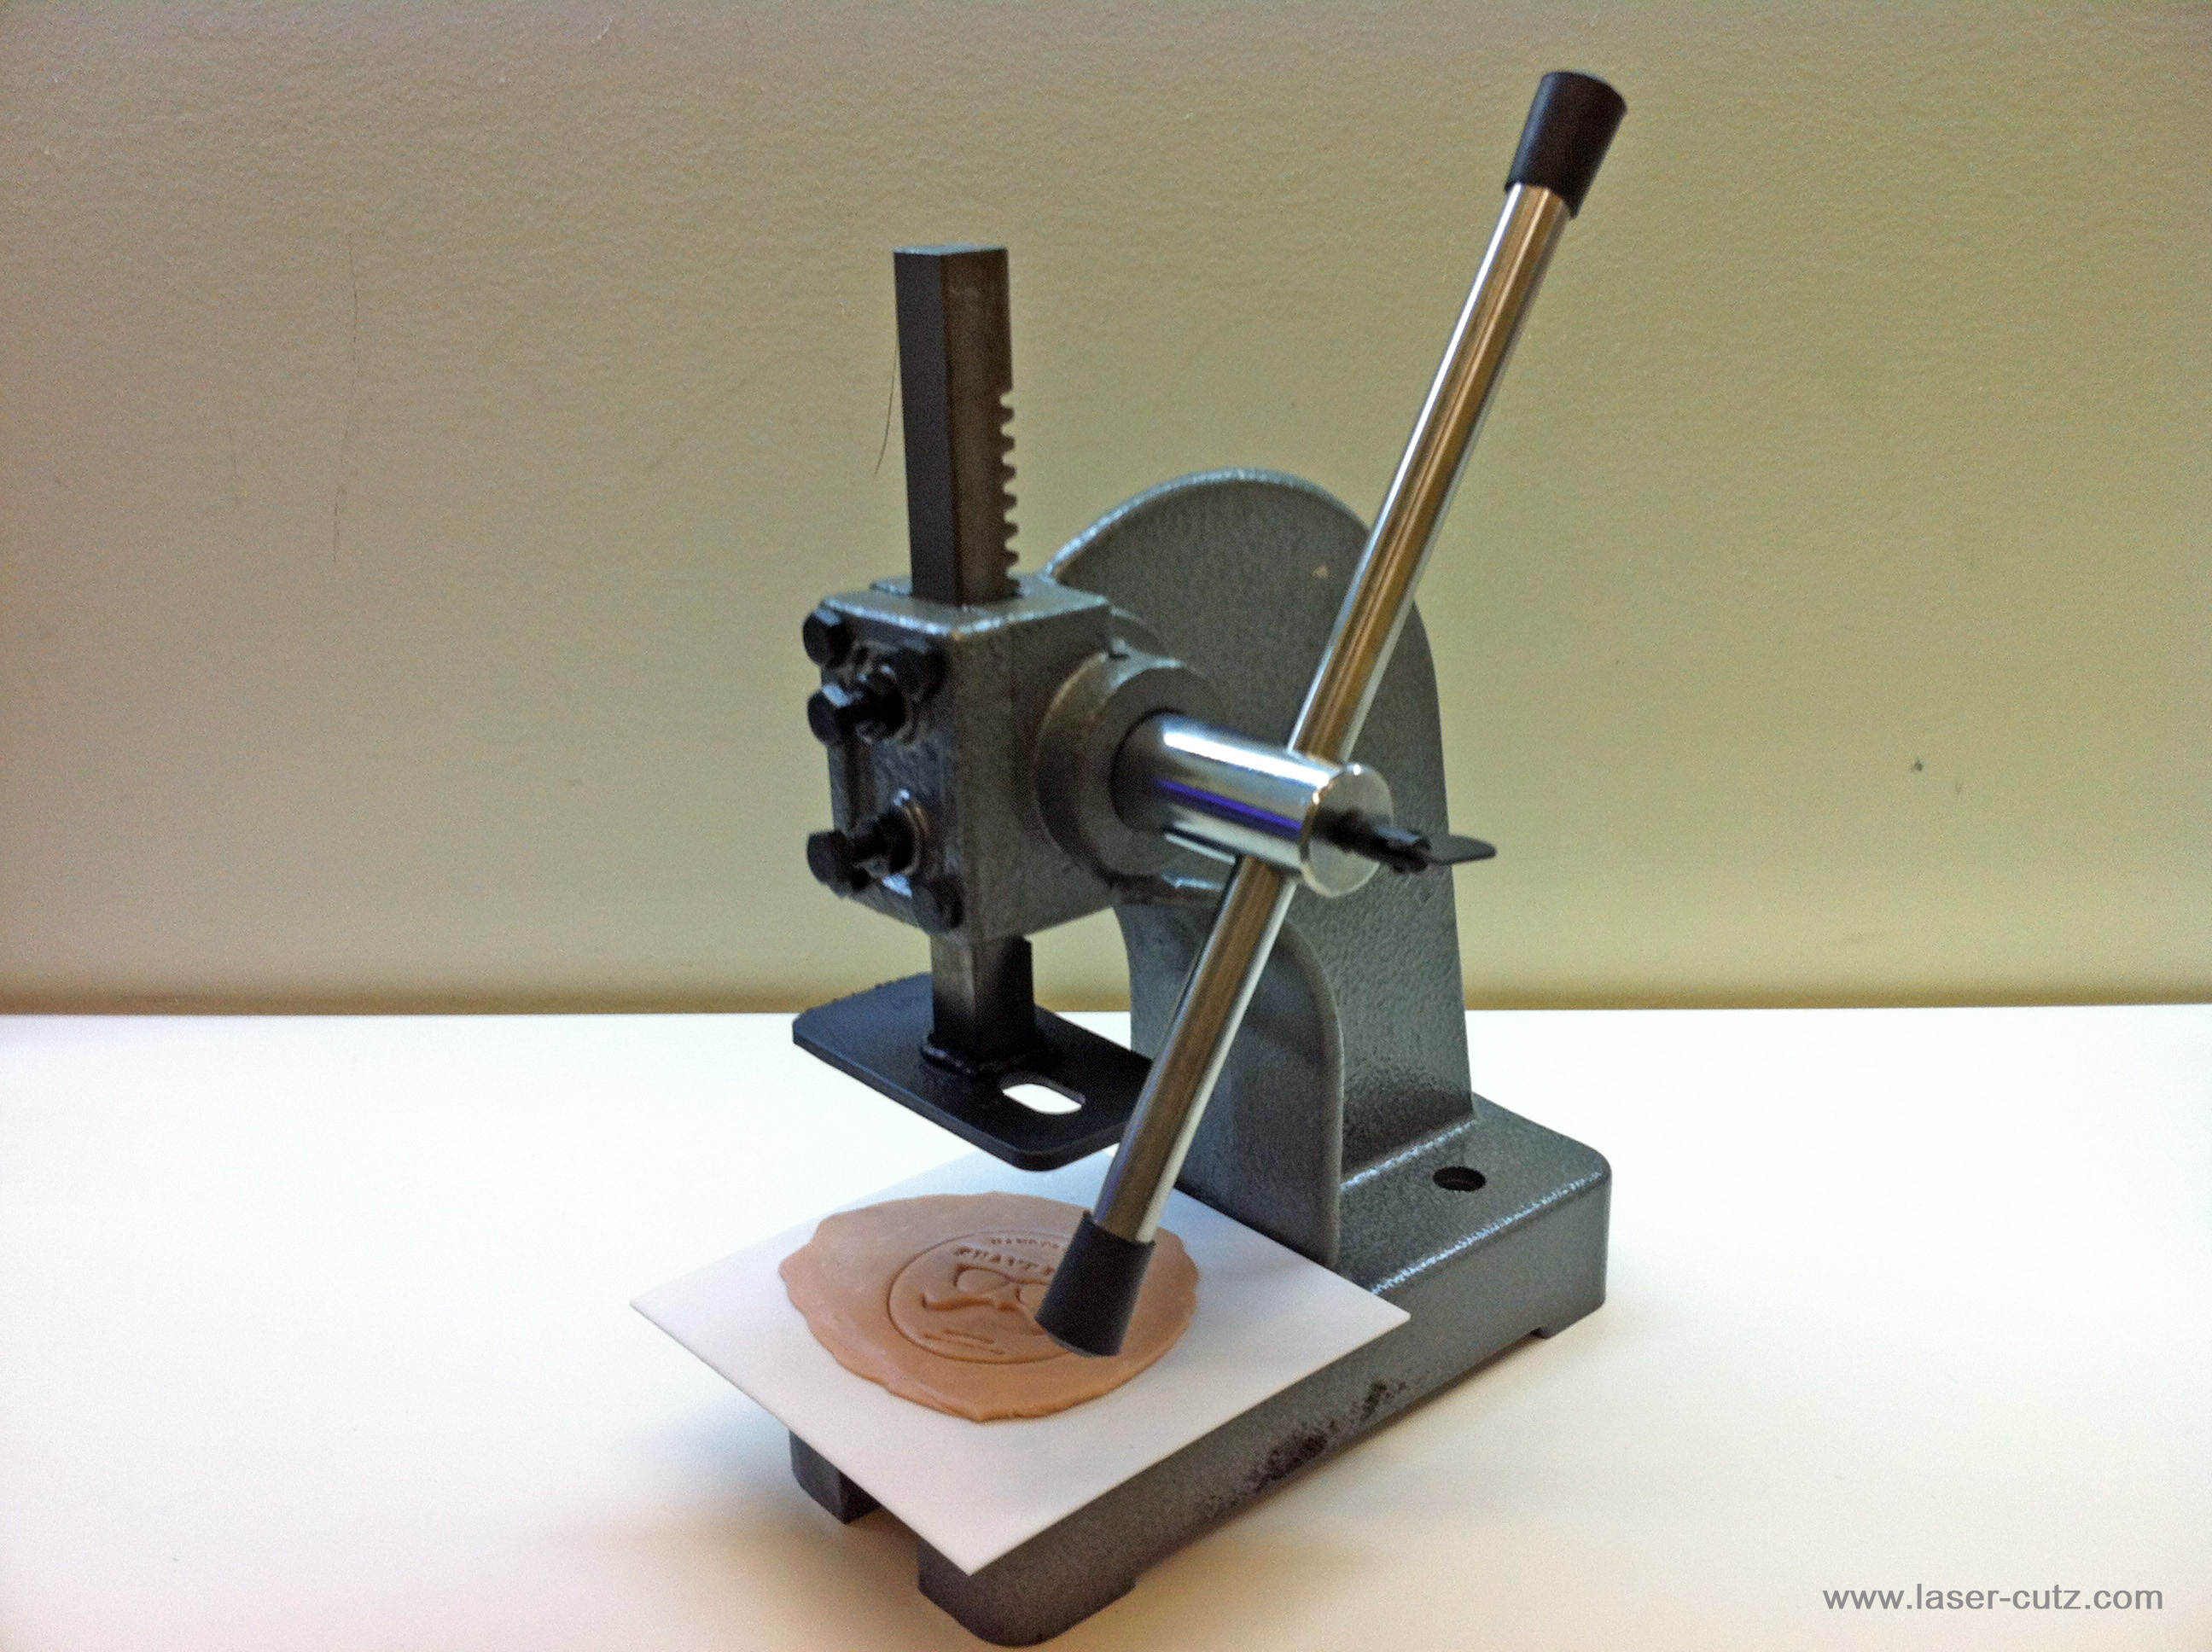 Laser cutz custom soap logo imprint press machine for Metal stamping press for jewelry